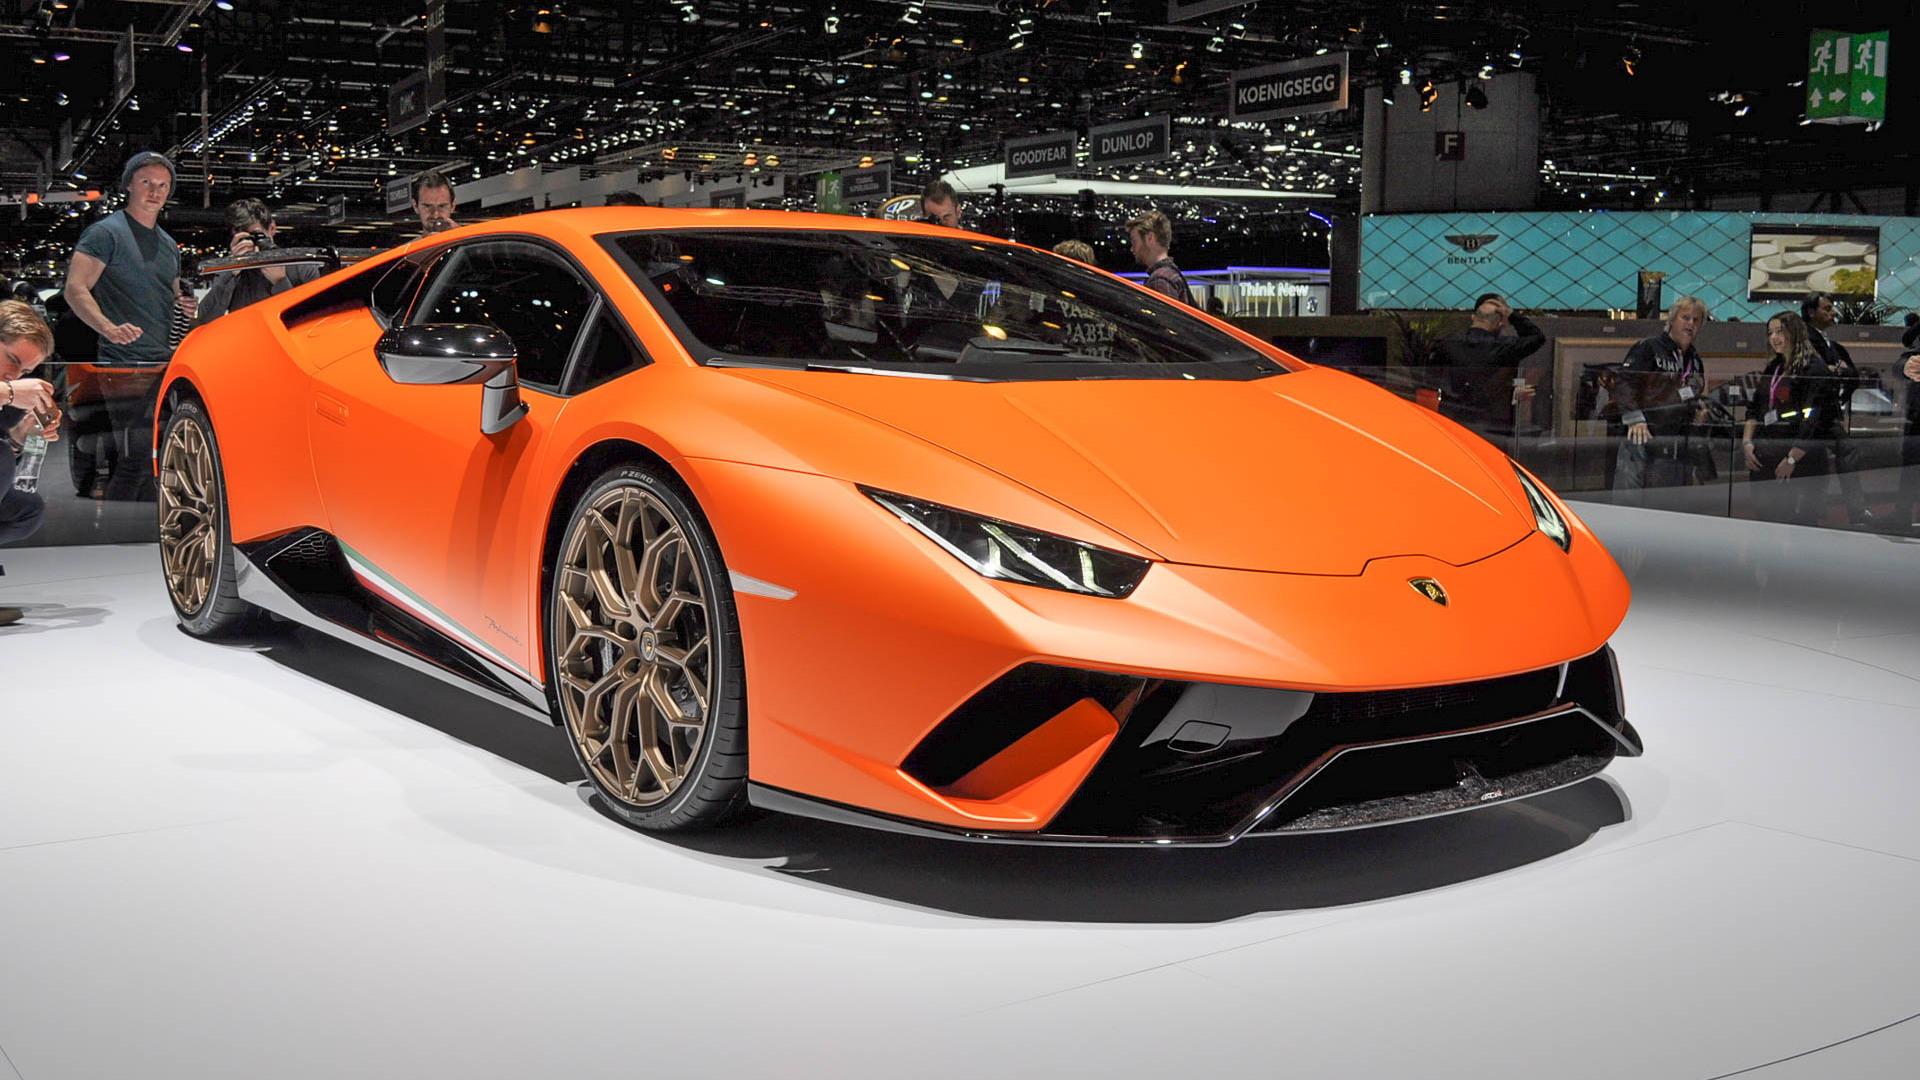 Lamborghini Huracán Performante, 2017 Geneva auto show